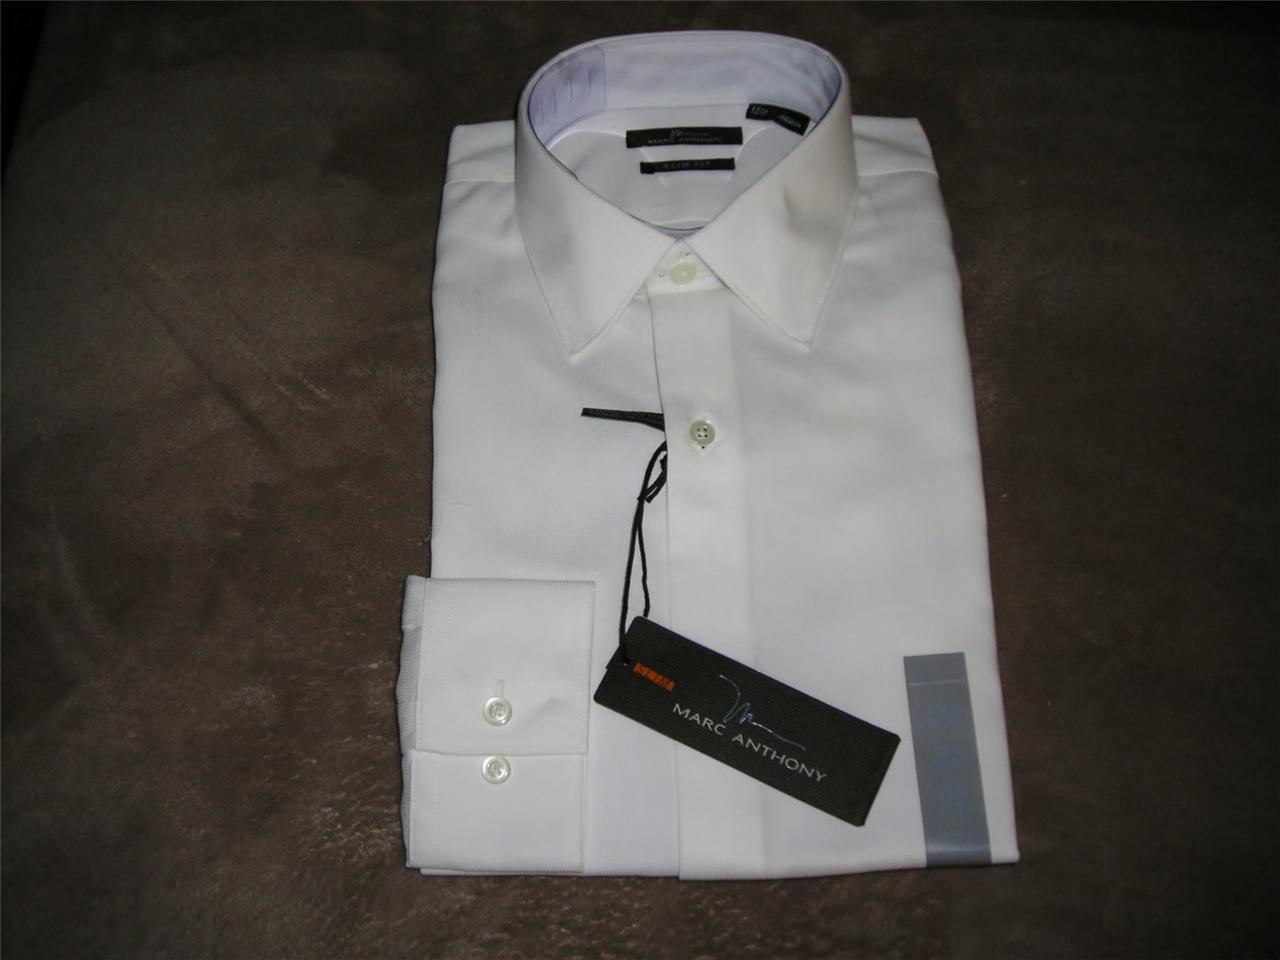 Marc anthony slim fit spread collar dobby dress shirt dif for Tony collar dress shirt